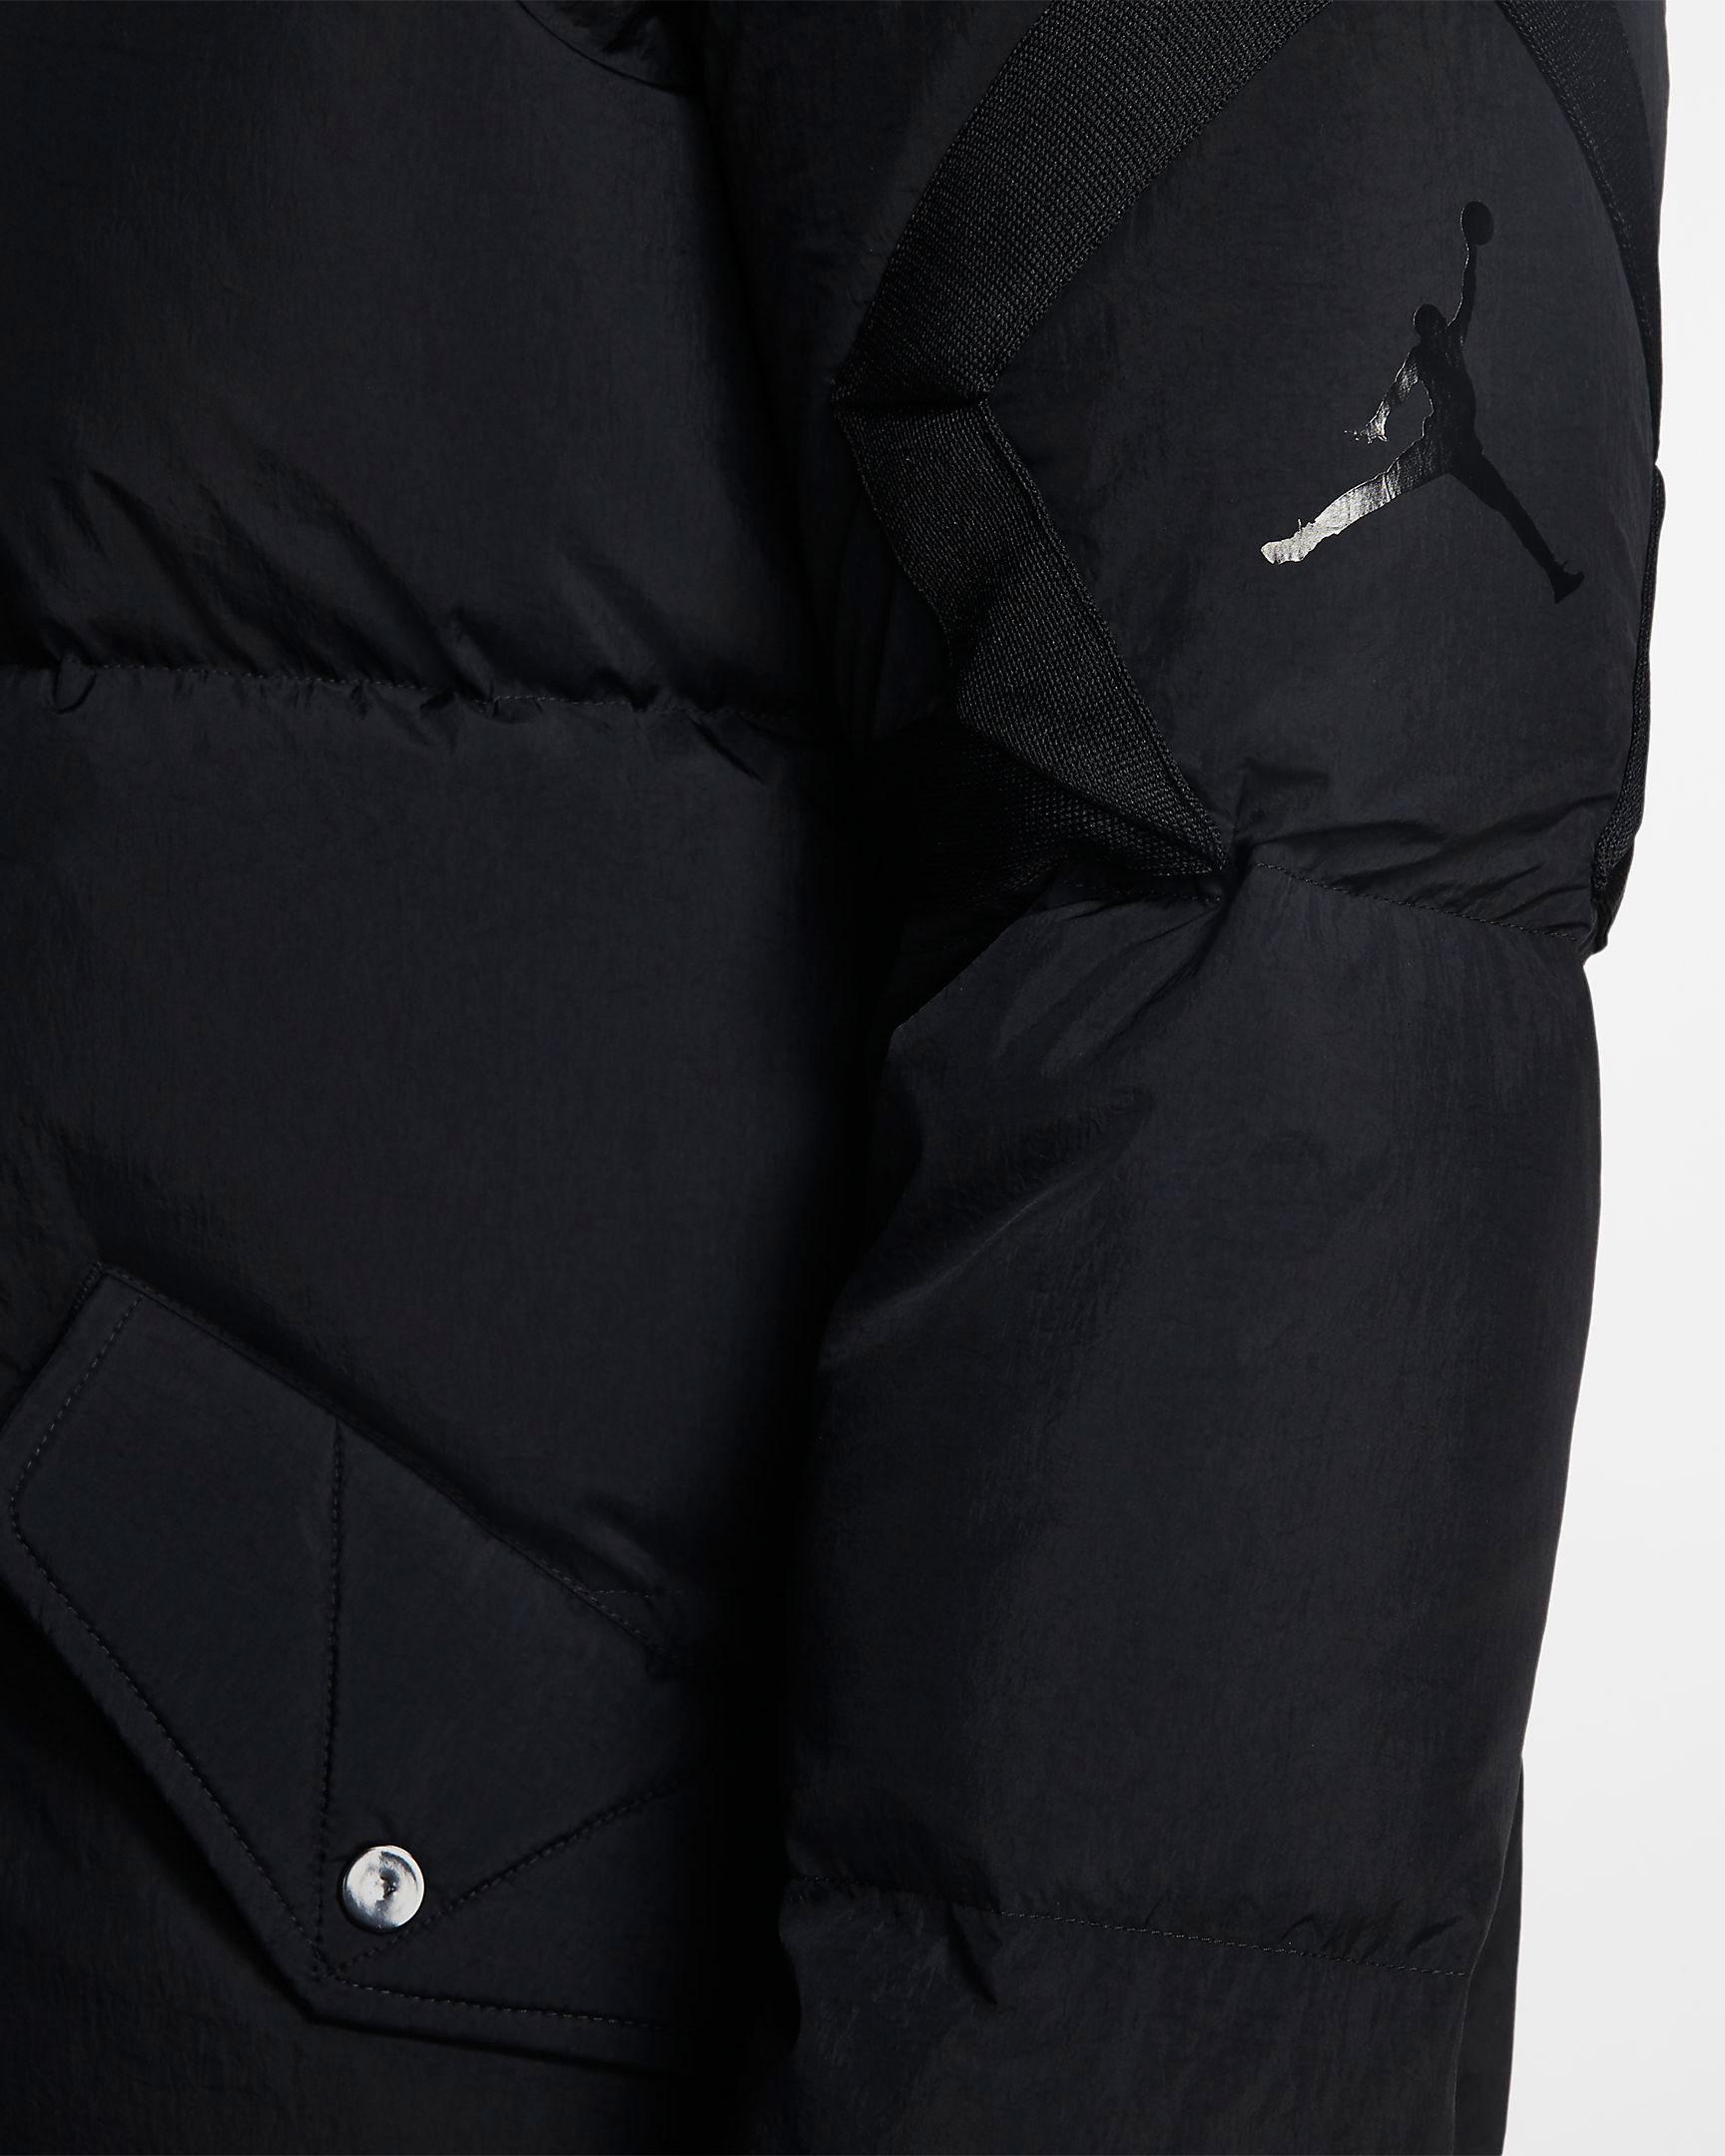 jordan-wings-down-parka-jacket-black-4